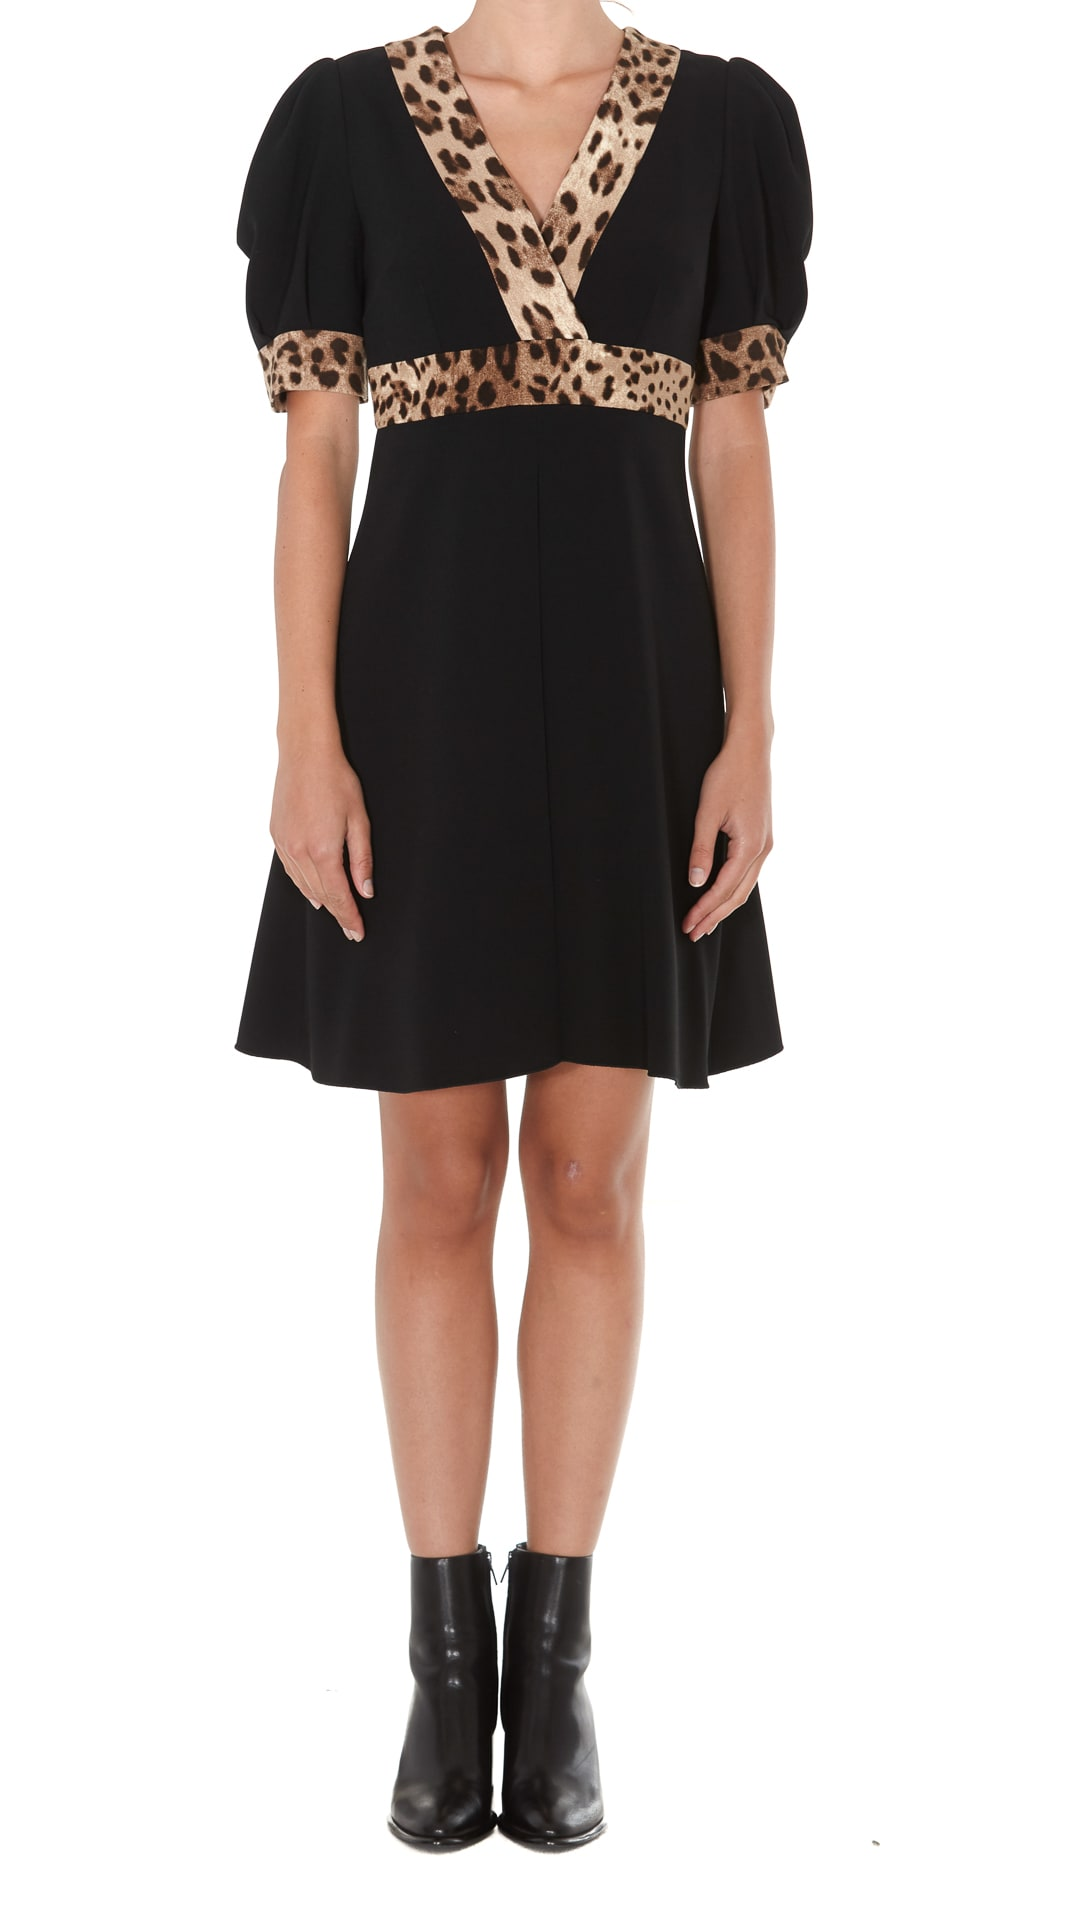 Dolce & Gabbana Short Cady Dress With Leopard Print Details